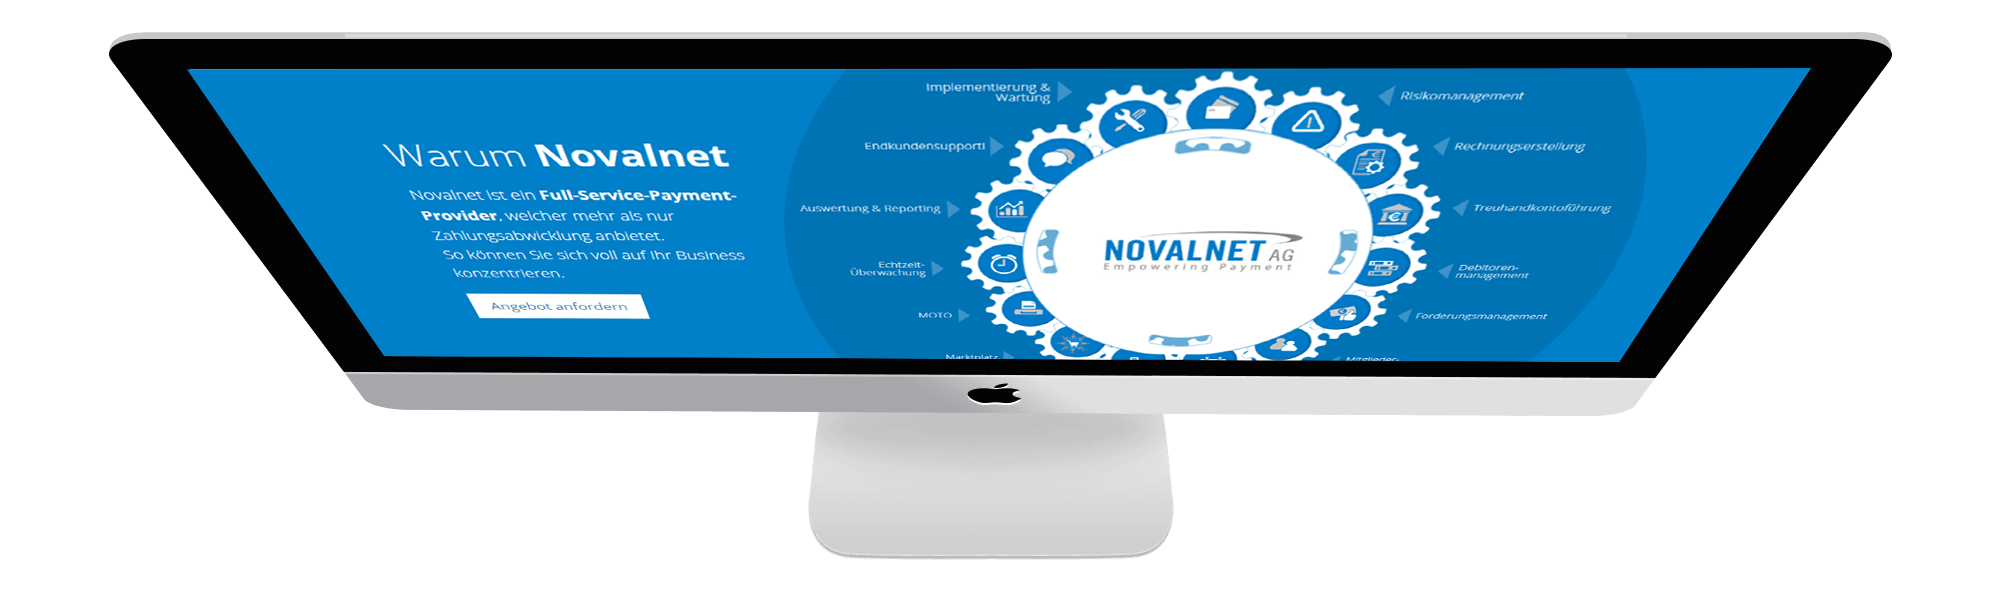 Novalnet_BrandCrock-portfolio-payment-services-imac